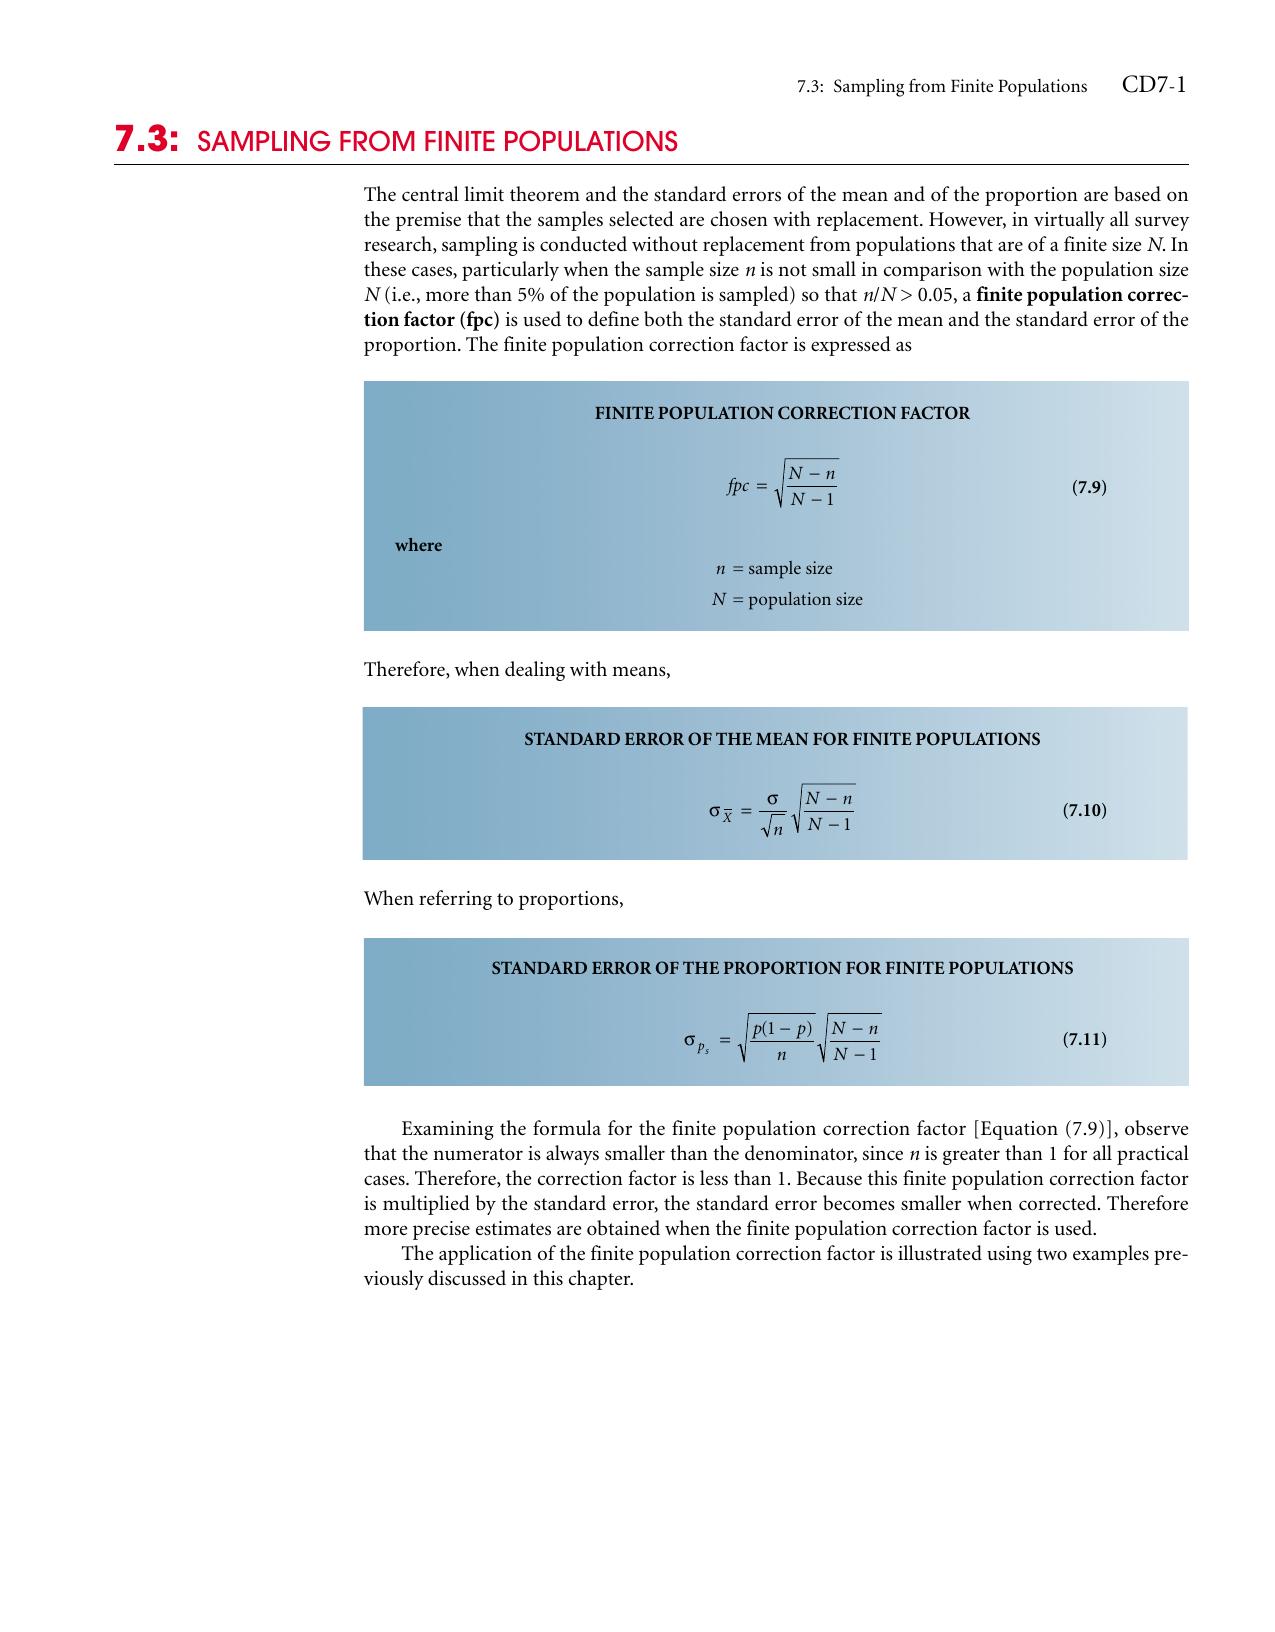 7.3: SAMPLING FROM FINITE POPULATIONS